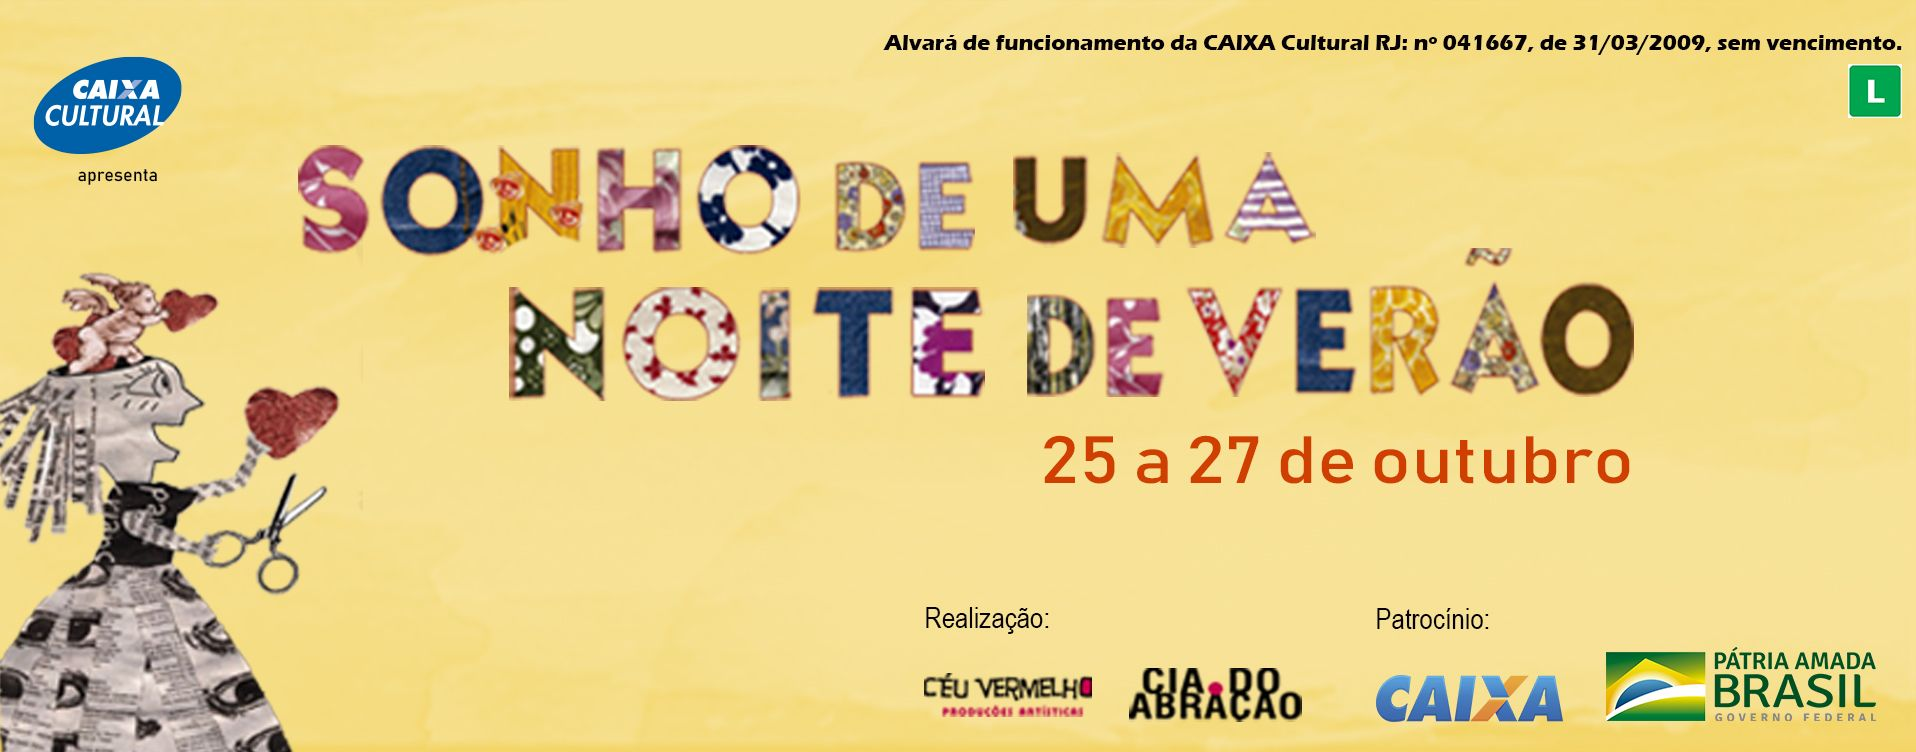 Caixa Cultural Rio de Janeiro